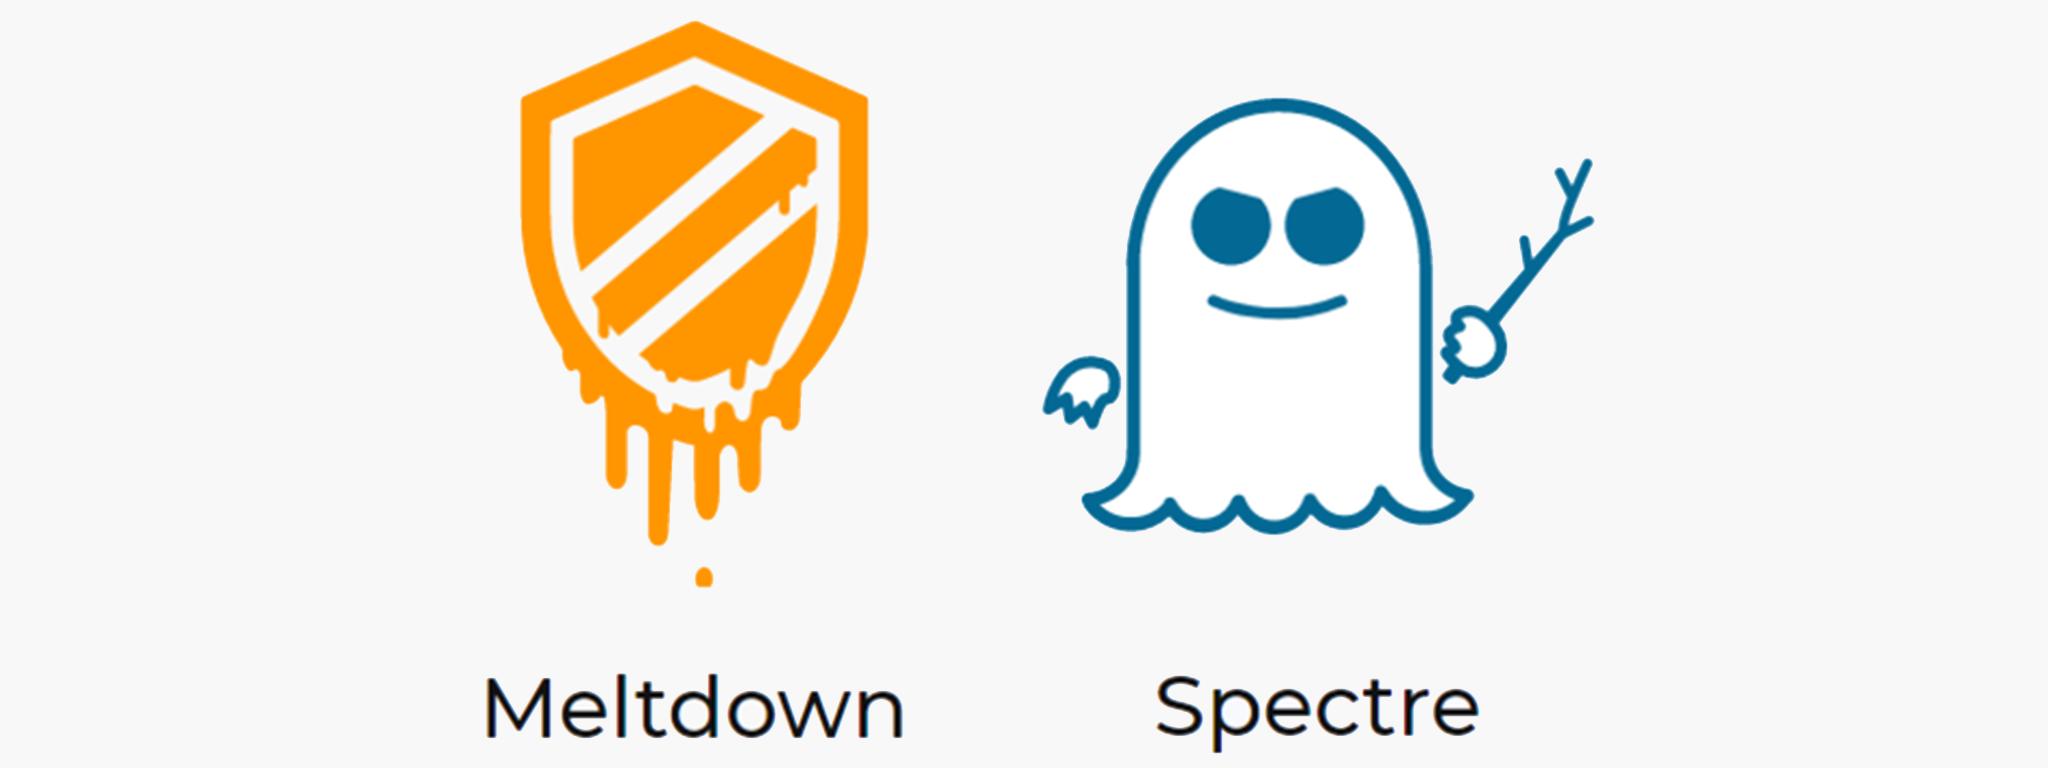 H Meltdown Spectre.png